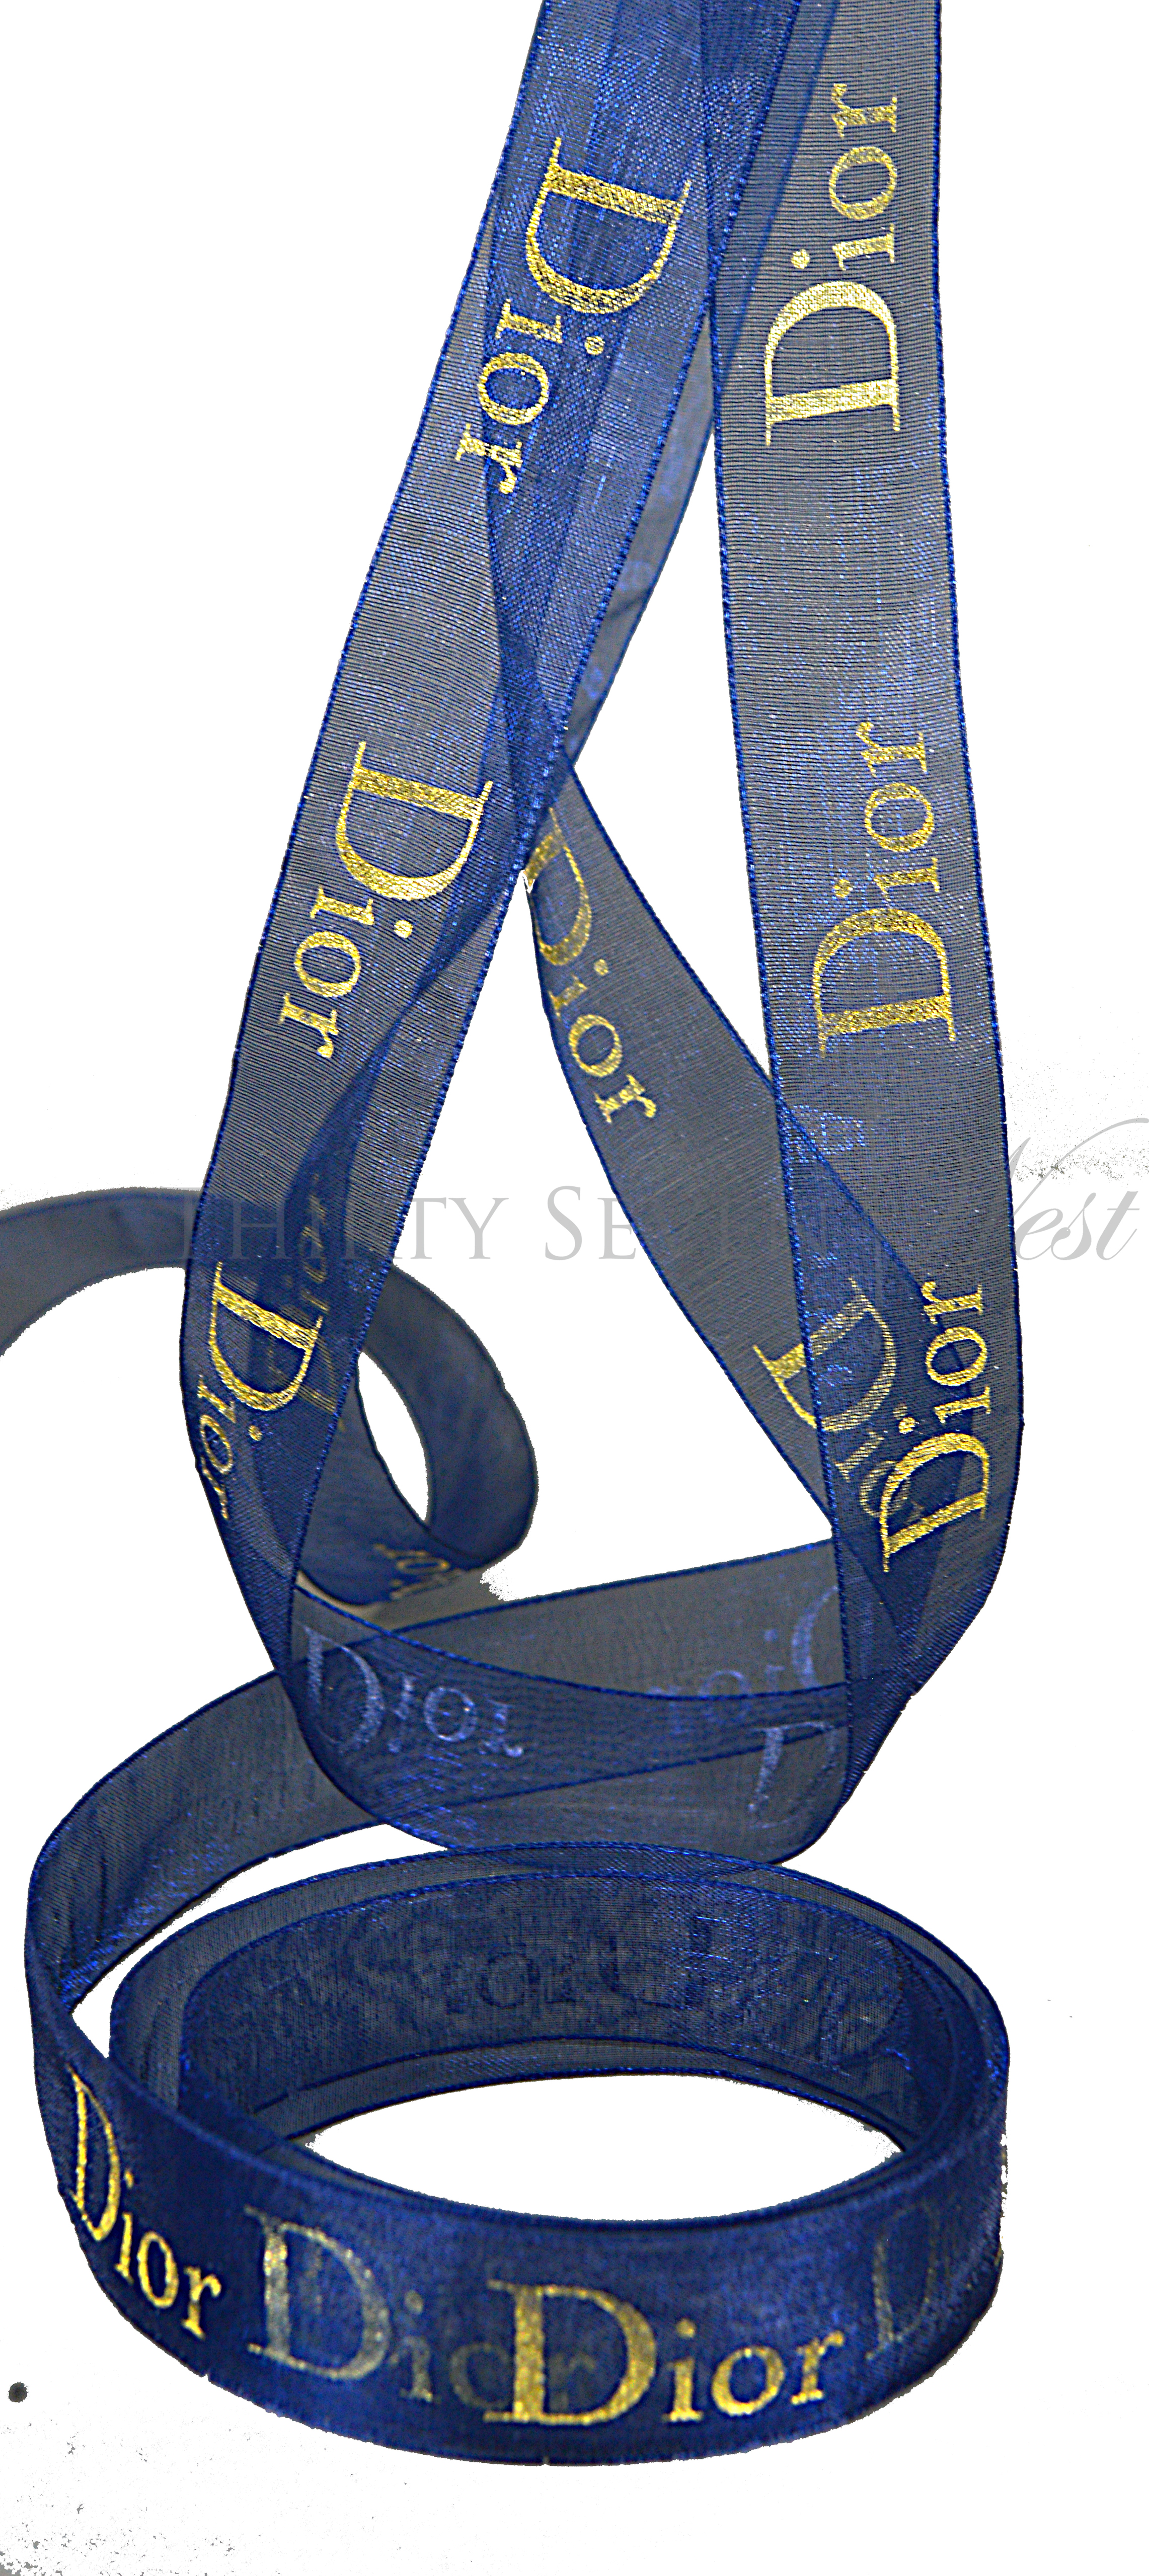 Branded Ribbon, Custom Logo Ribbon, Printed Logo Ribbon, Organza Ribbon, Corporate Ribbon,  Custom Ribbon Printing, Blue Organza Ribbon, Metallic Gold Print on Ribbon